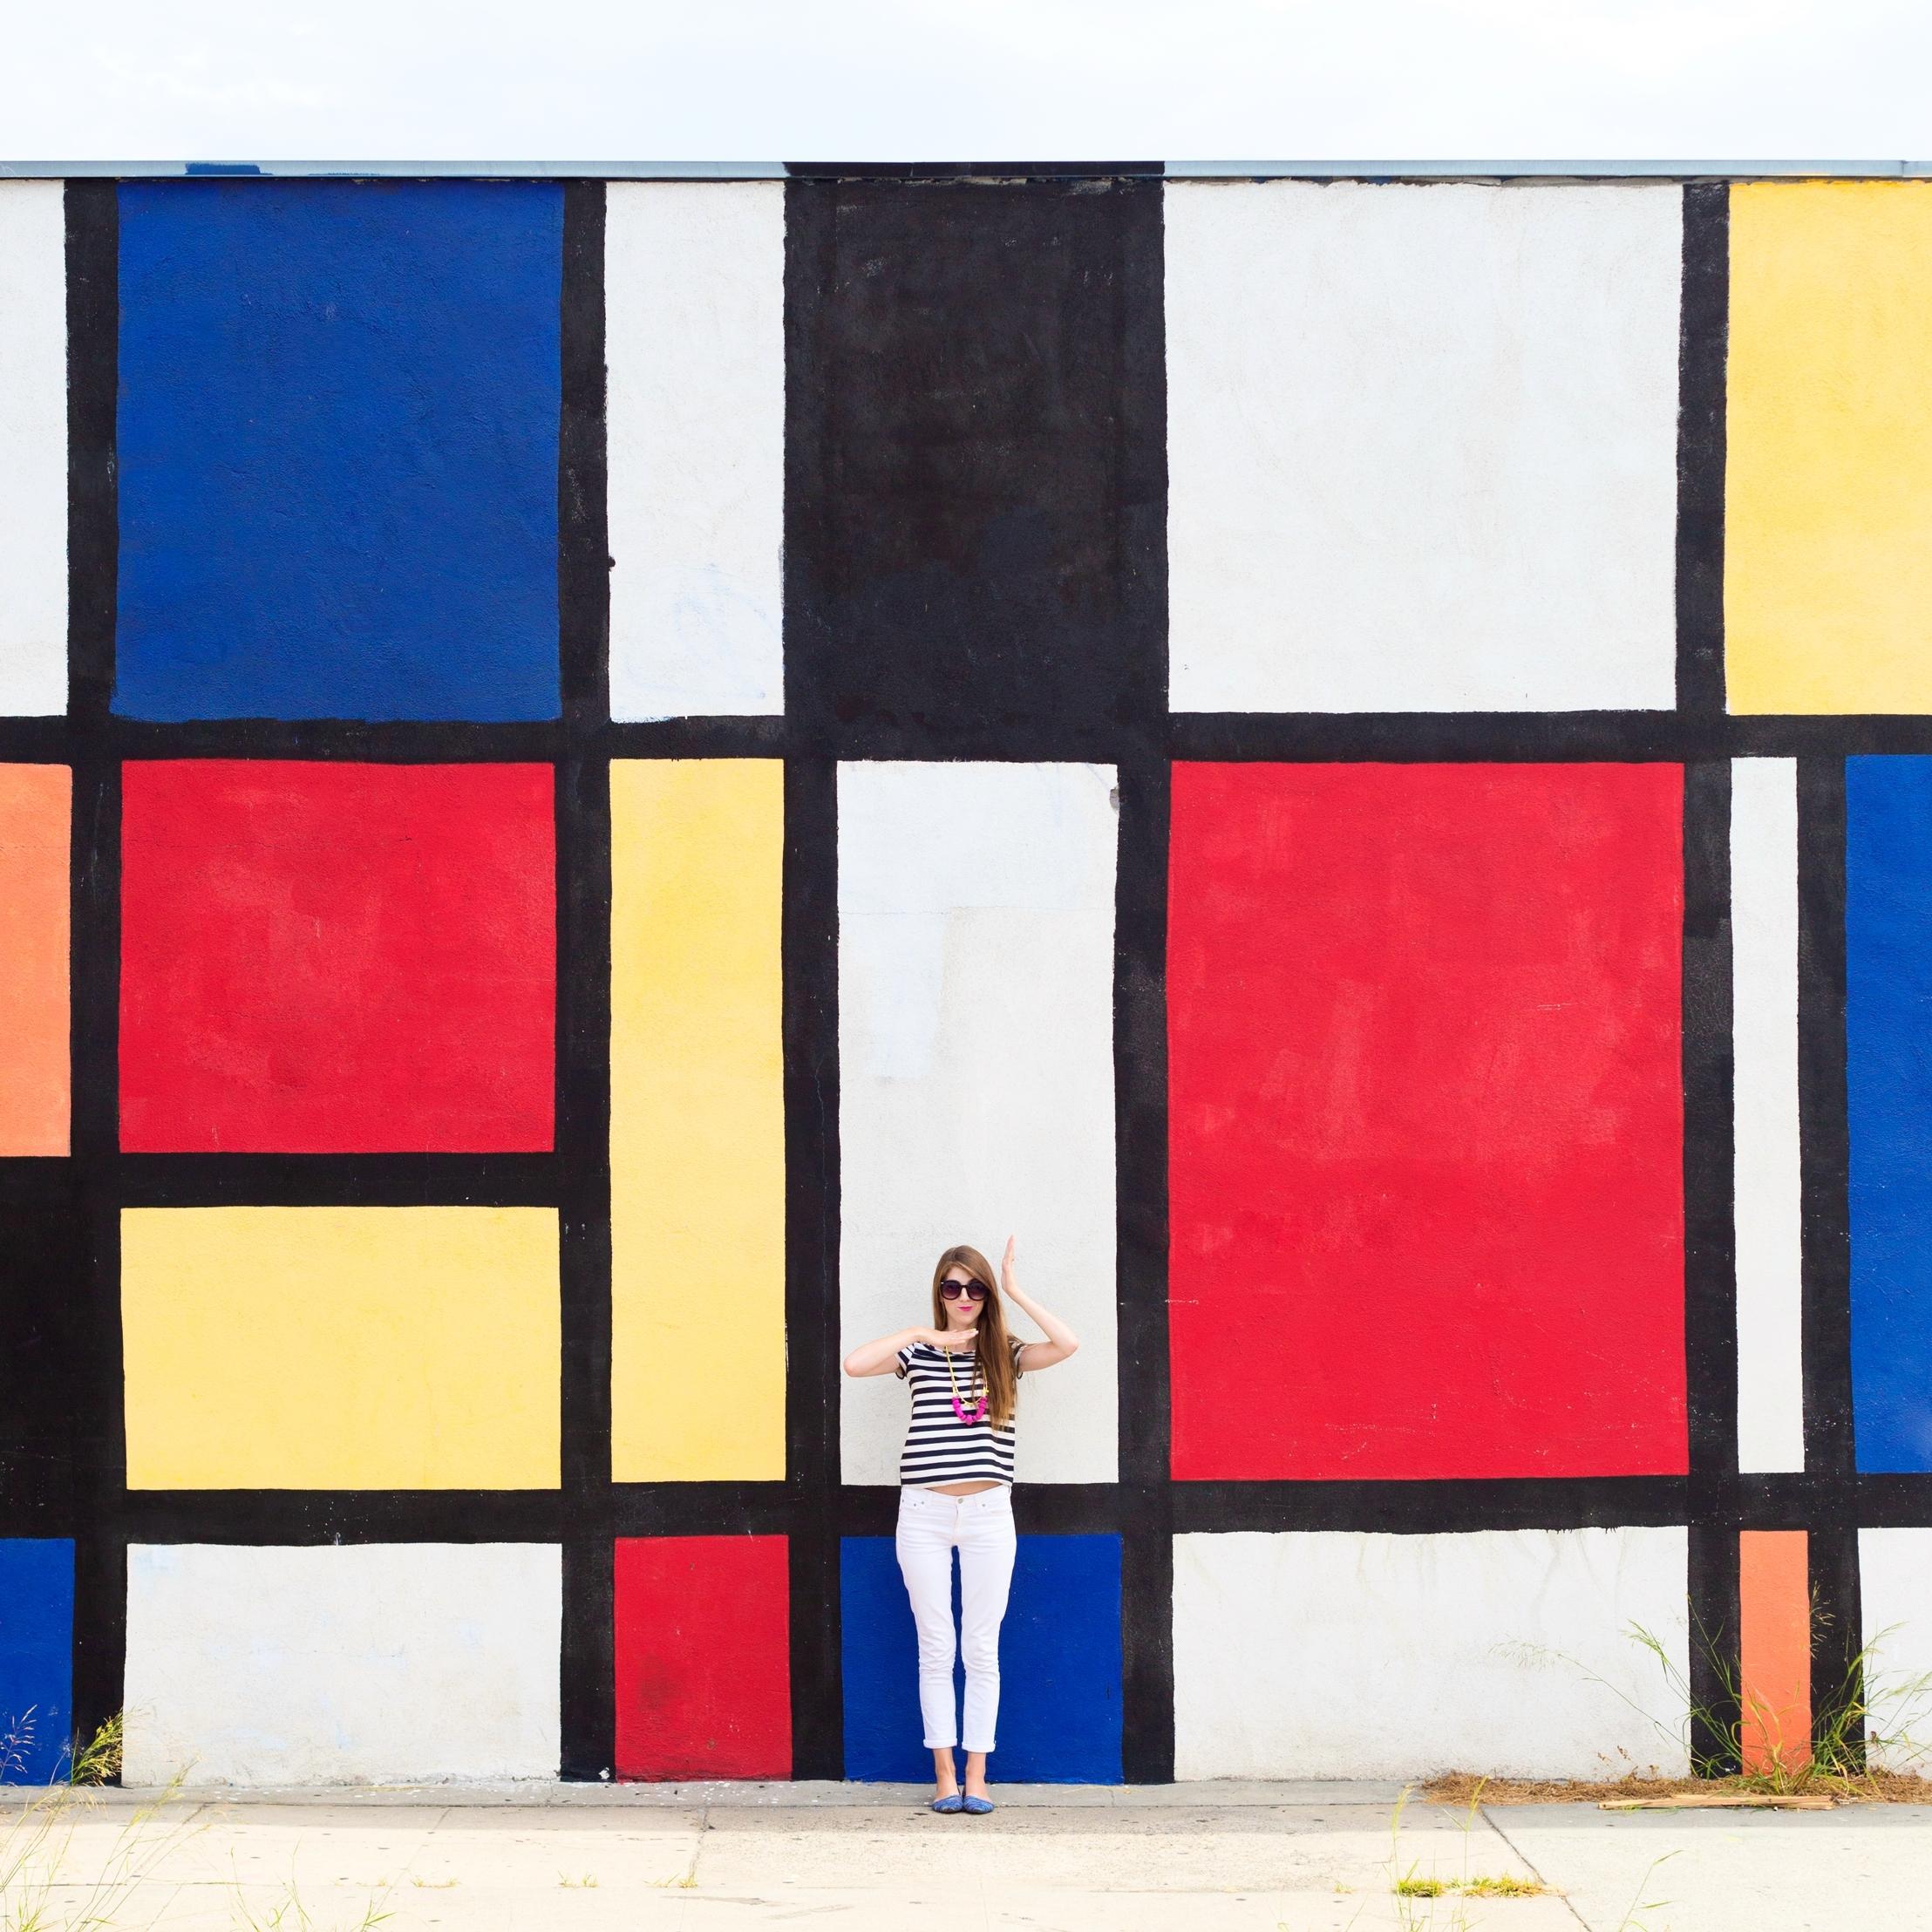 Studiodiywallcrawl: The Best Walls In Los Angeles – Studio Diy Throughout Los Angeles Wall Art (View 14 of 20)